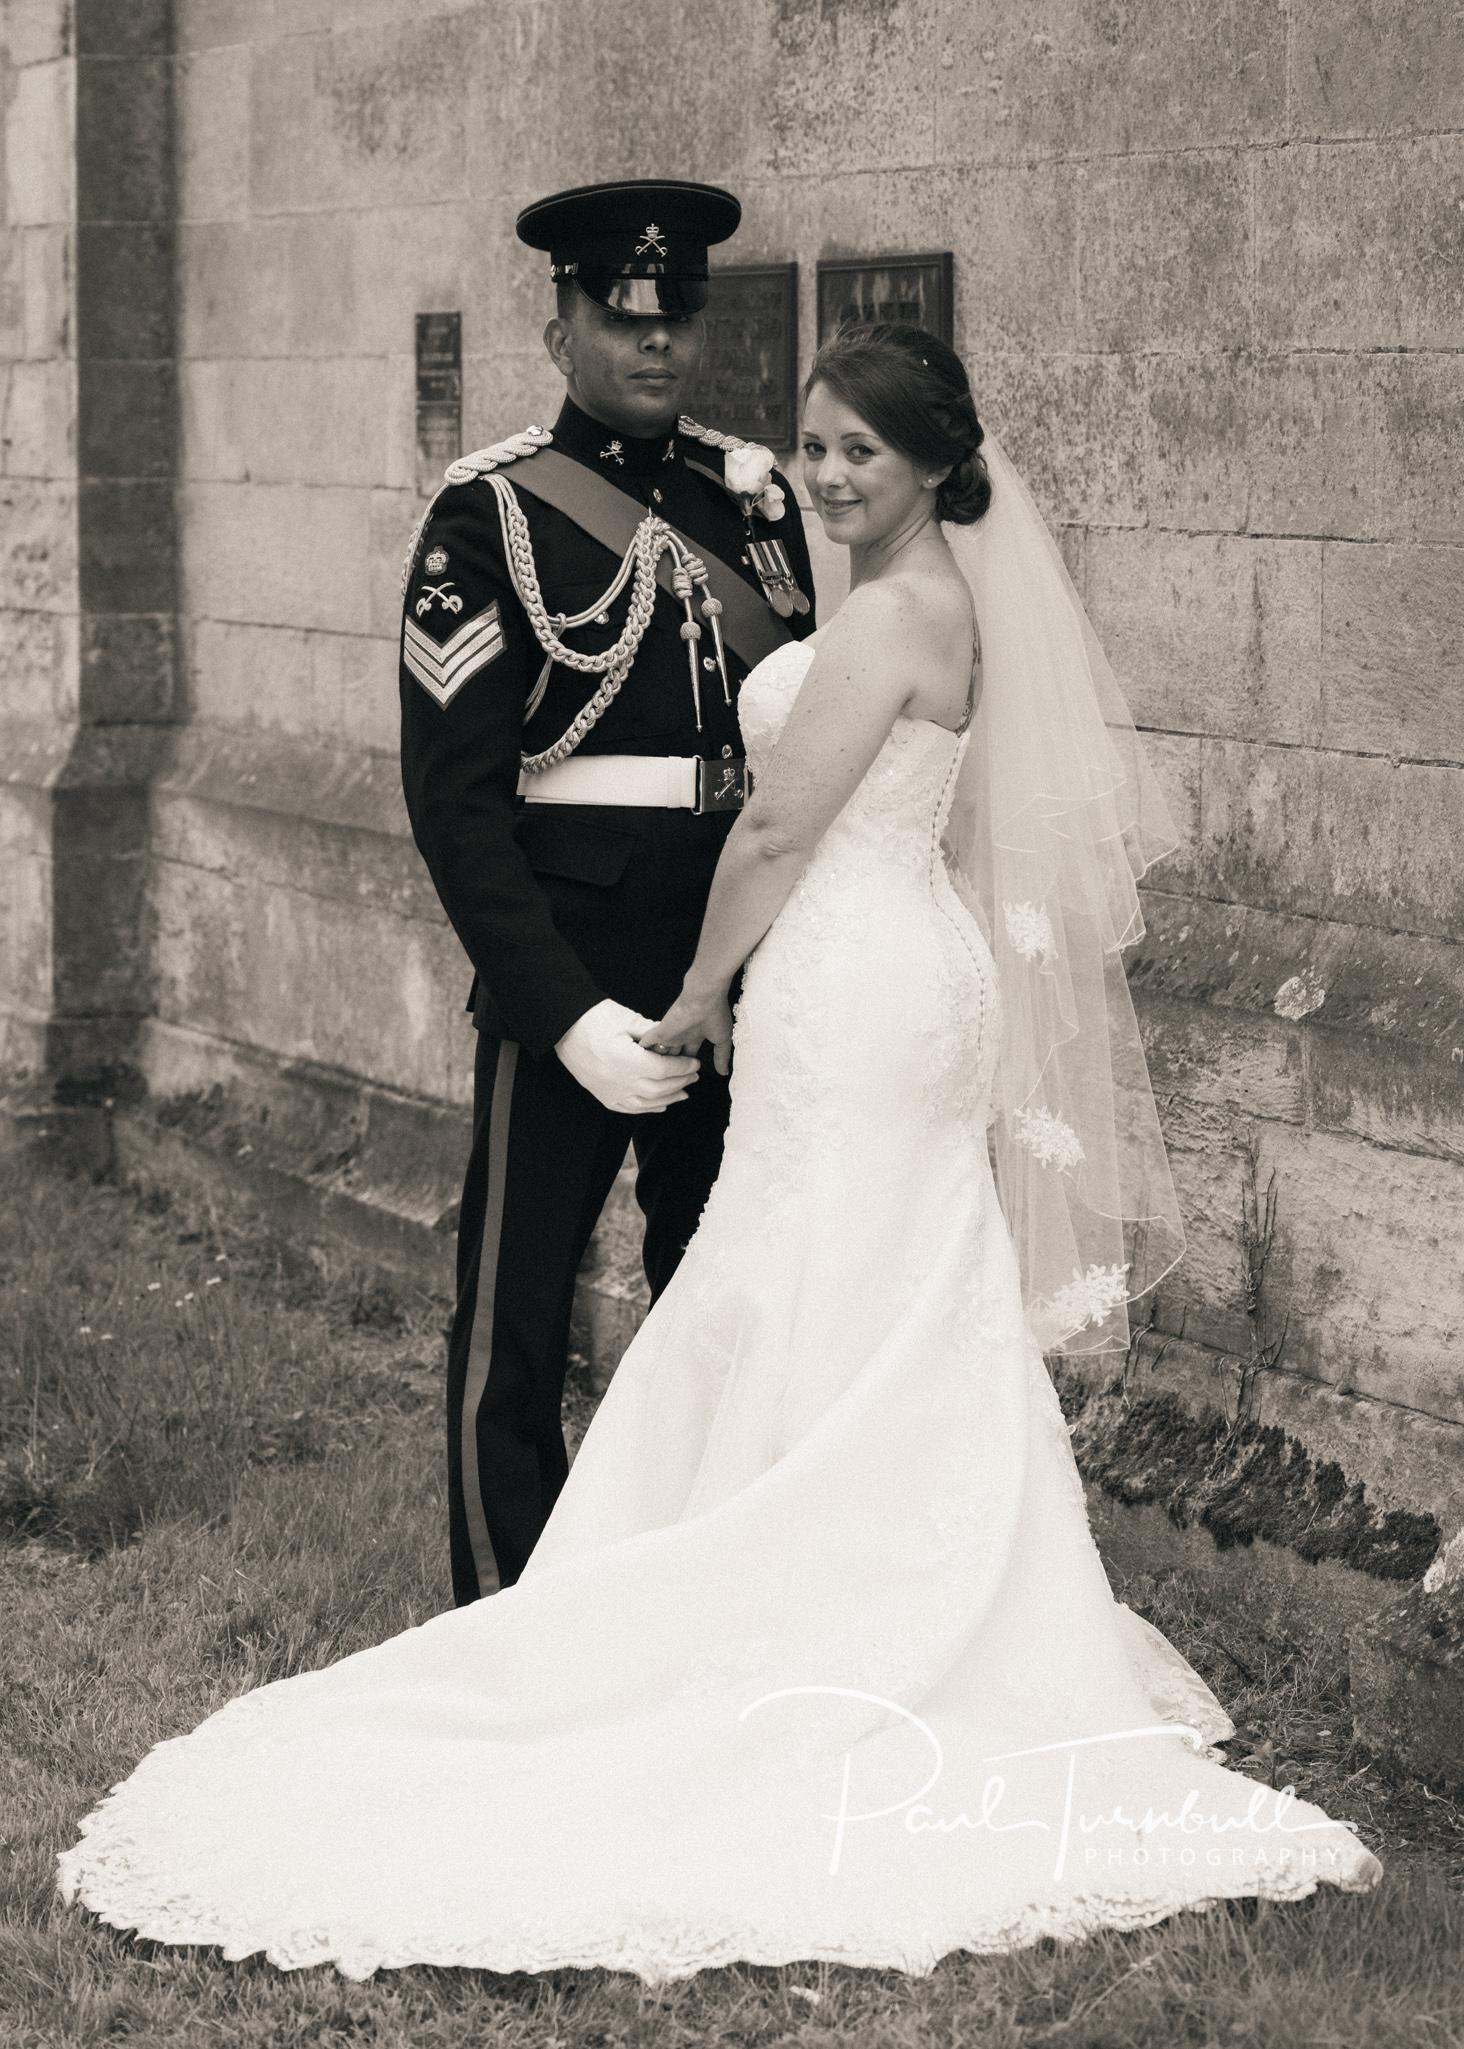 wedding-photographer-south-dalton-walkington-yorkshire-emma-james-044.jpg